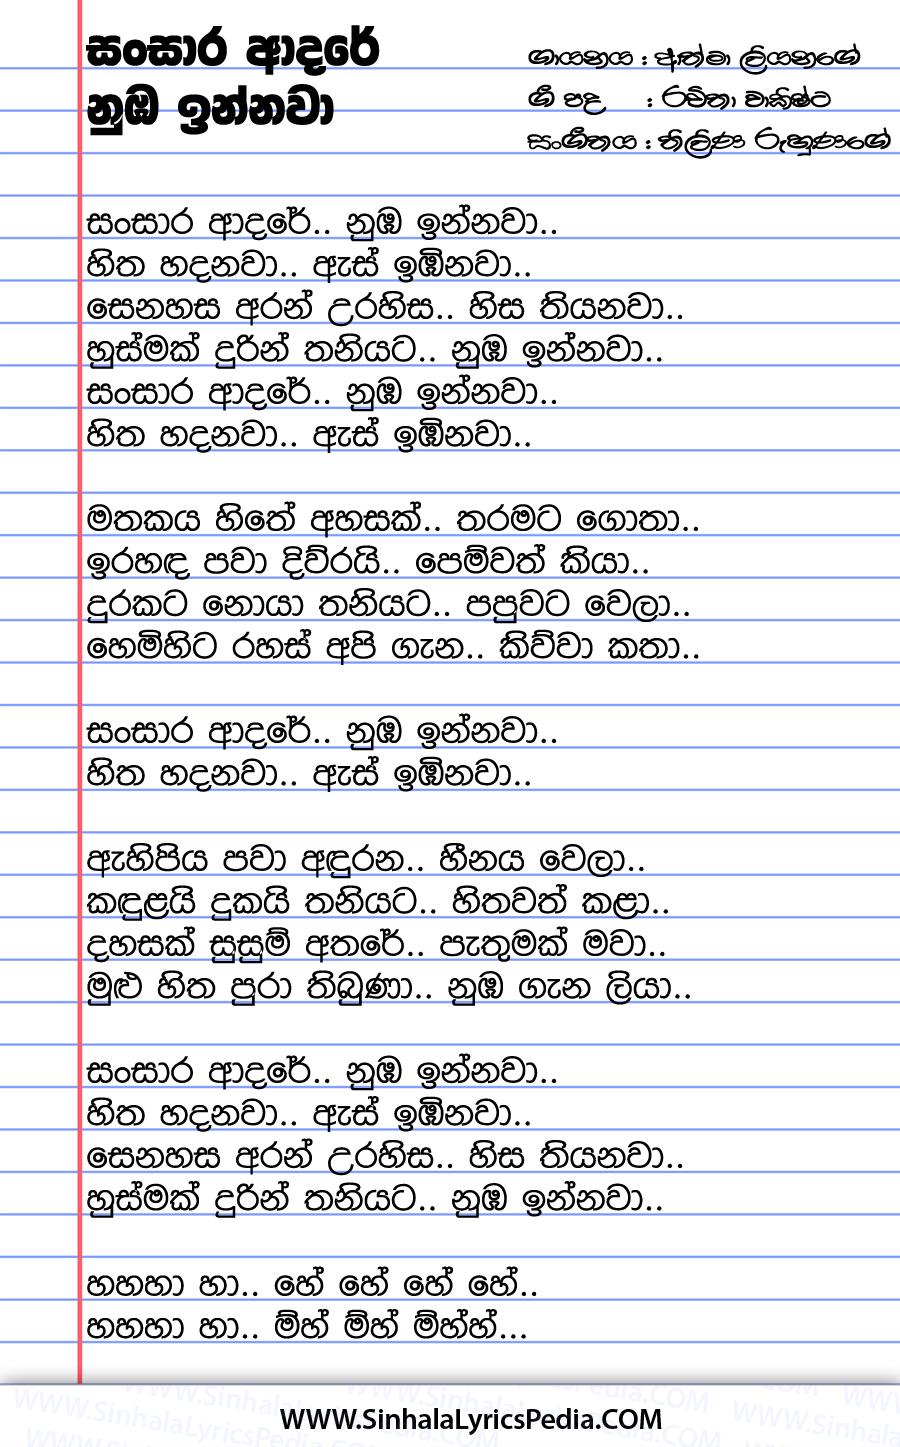 Sansara Adare Nuba Innawa Song Lyrics